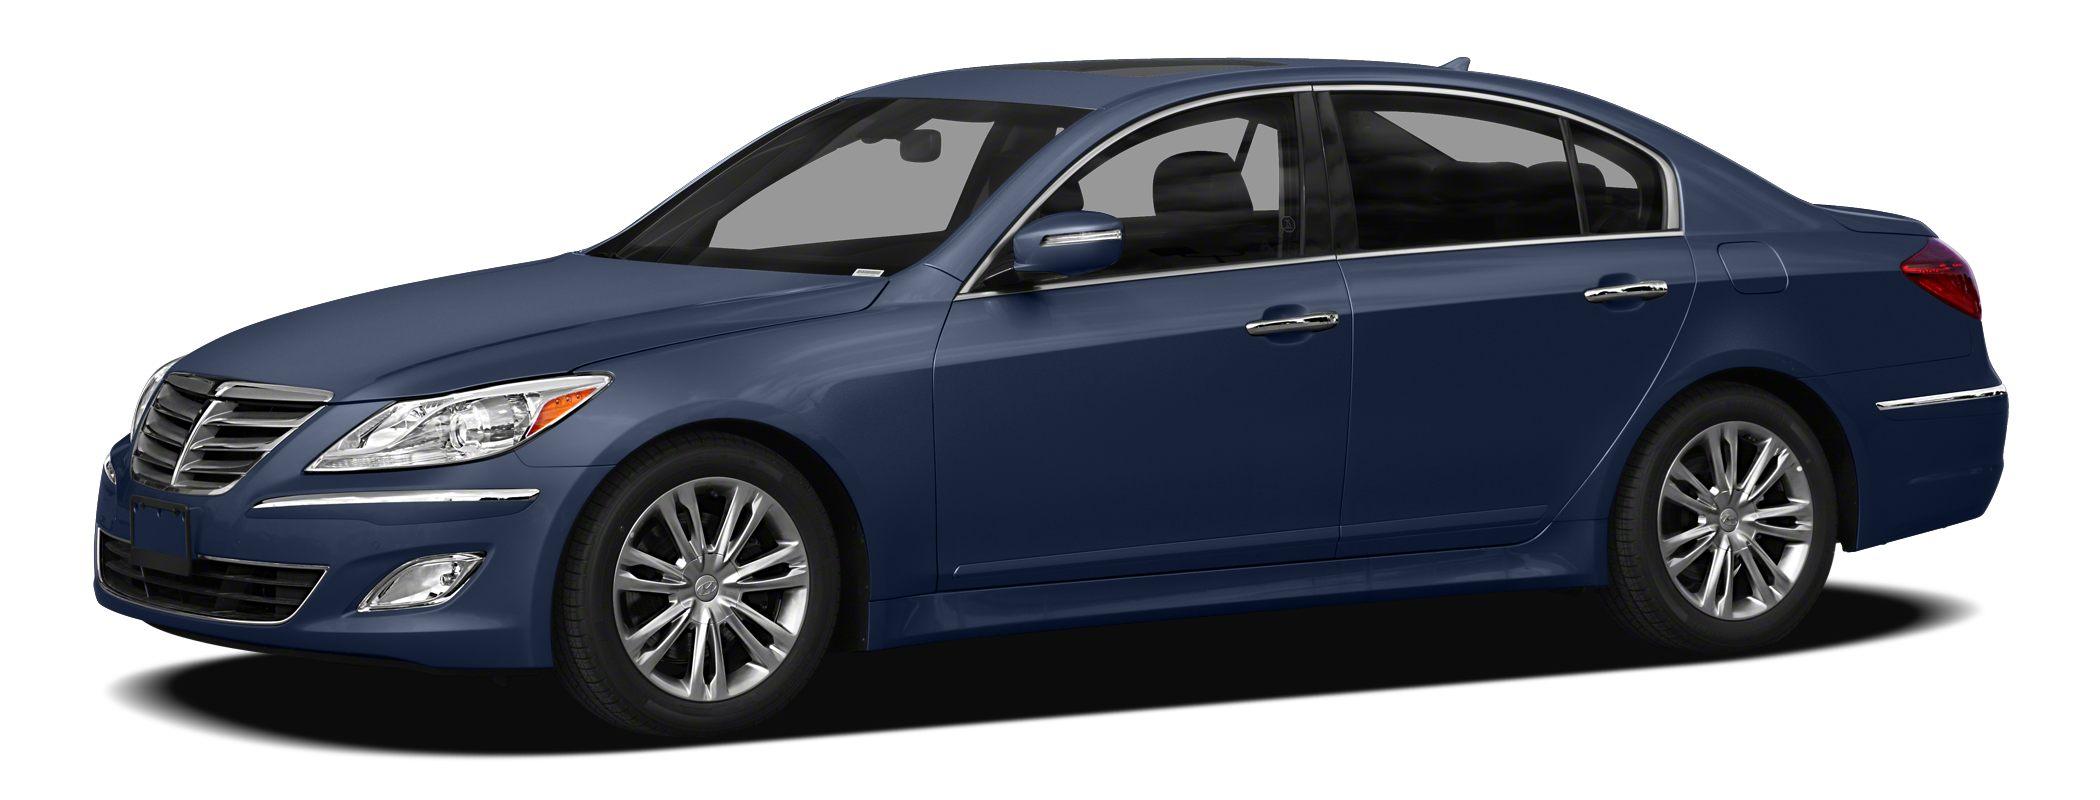 2012 Hyundai Genesis 46 Miles 58877Color Twilight Blue Pearl Stock H13274A VIN KMHGC4DF6CU1